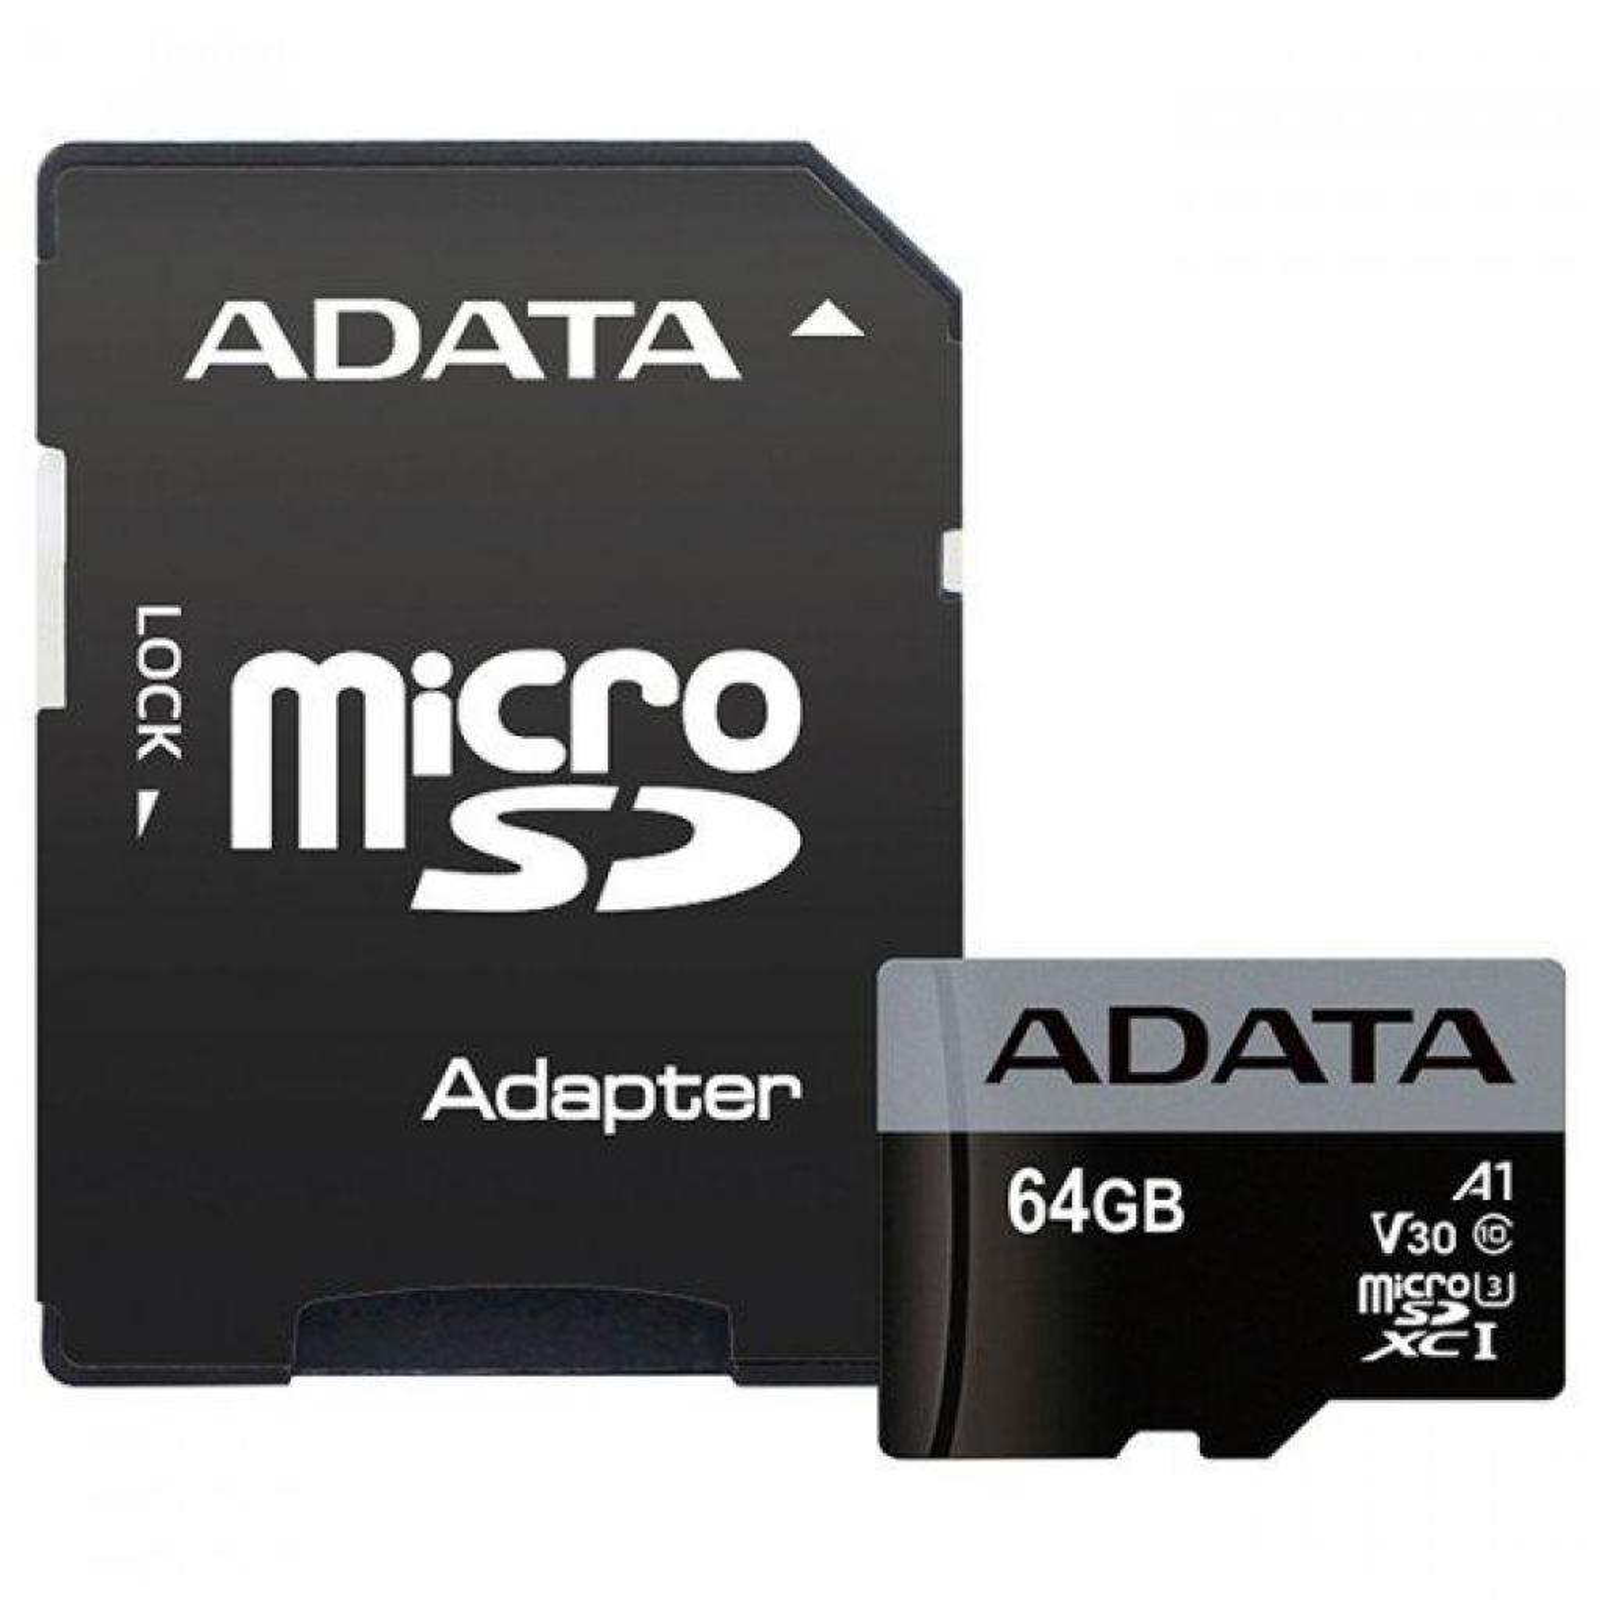 Карта памяти ADATA 64GB microSD class 10 UHS-I U3 A1 Premier Pro (AUSDX64GUI3V30SA1-RA1)